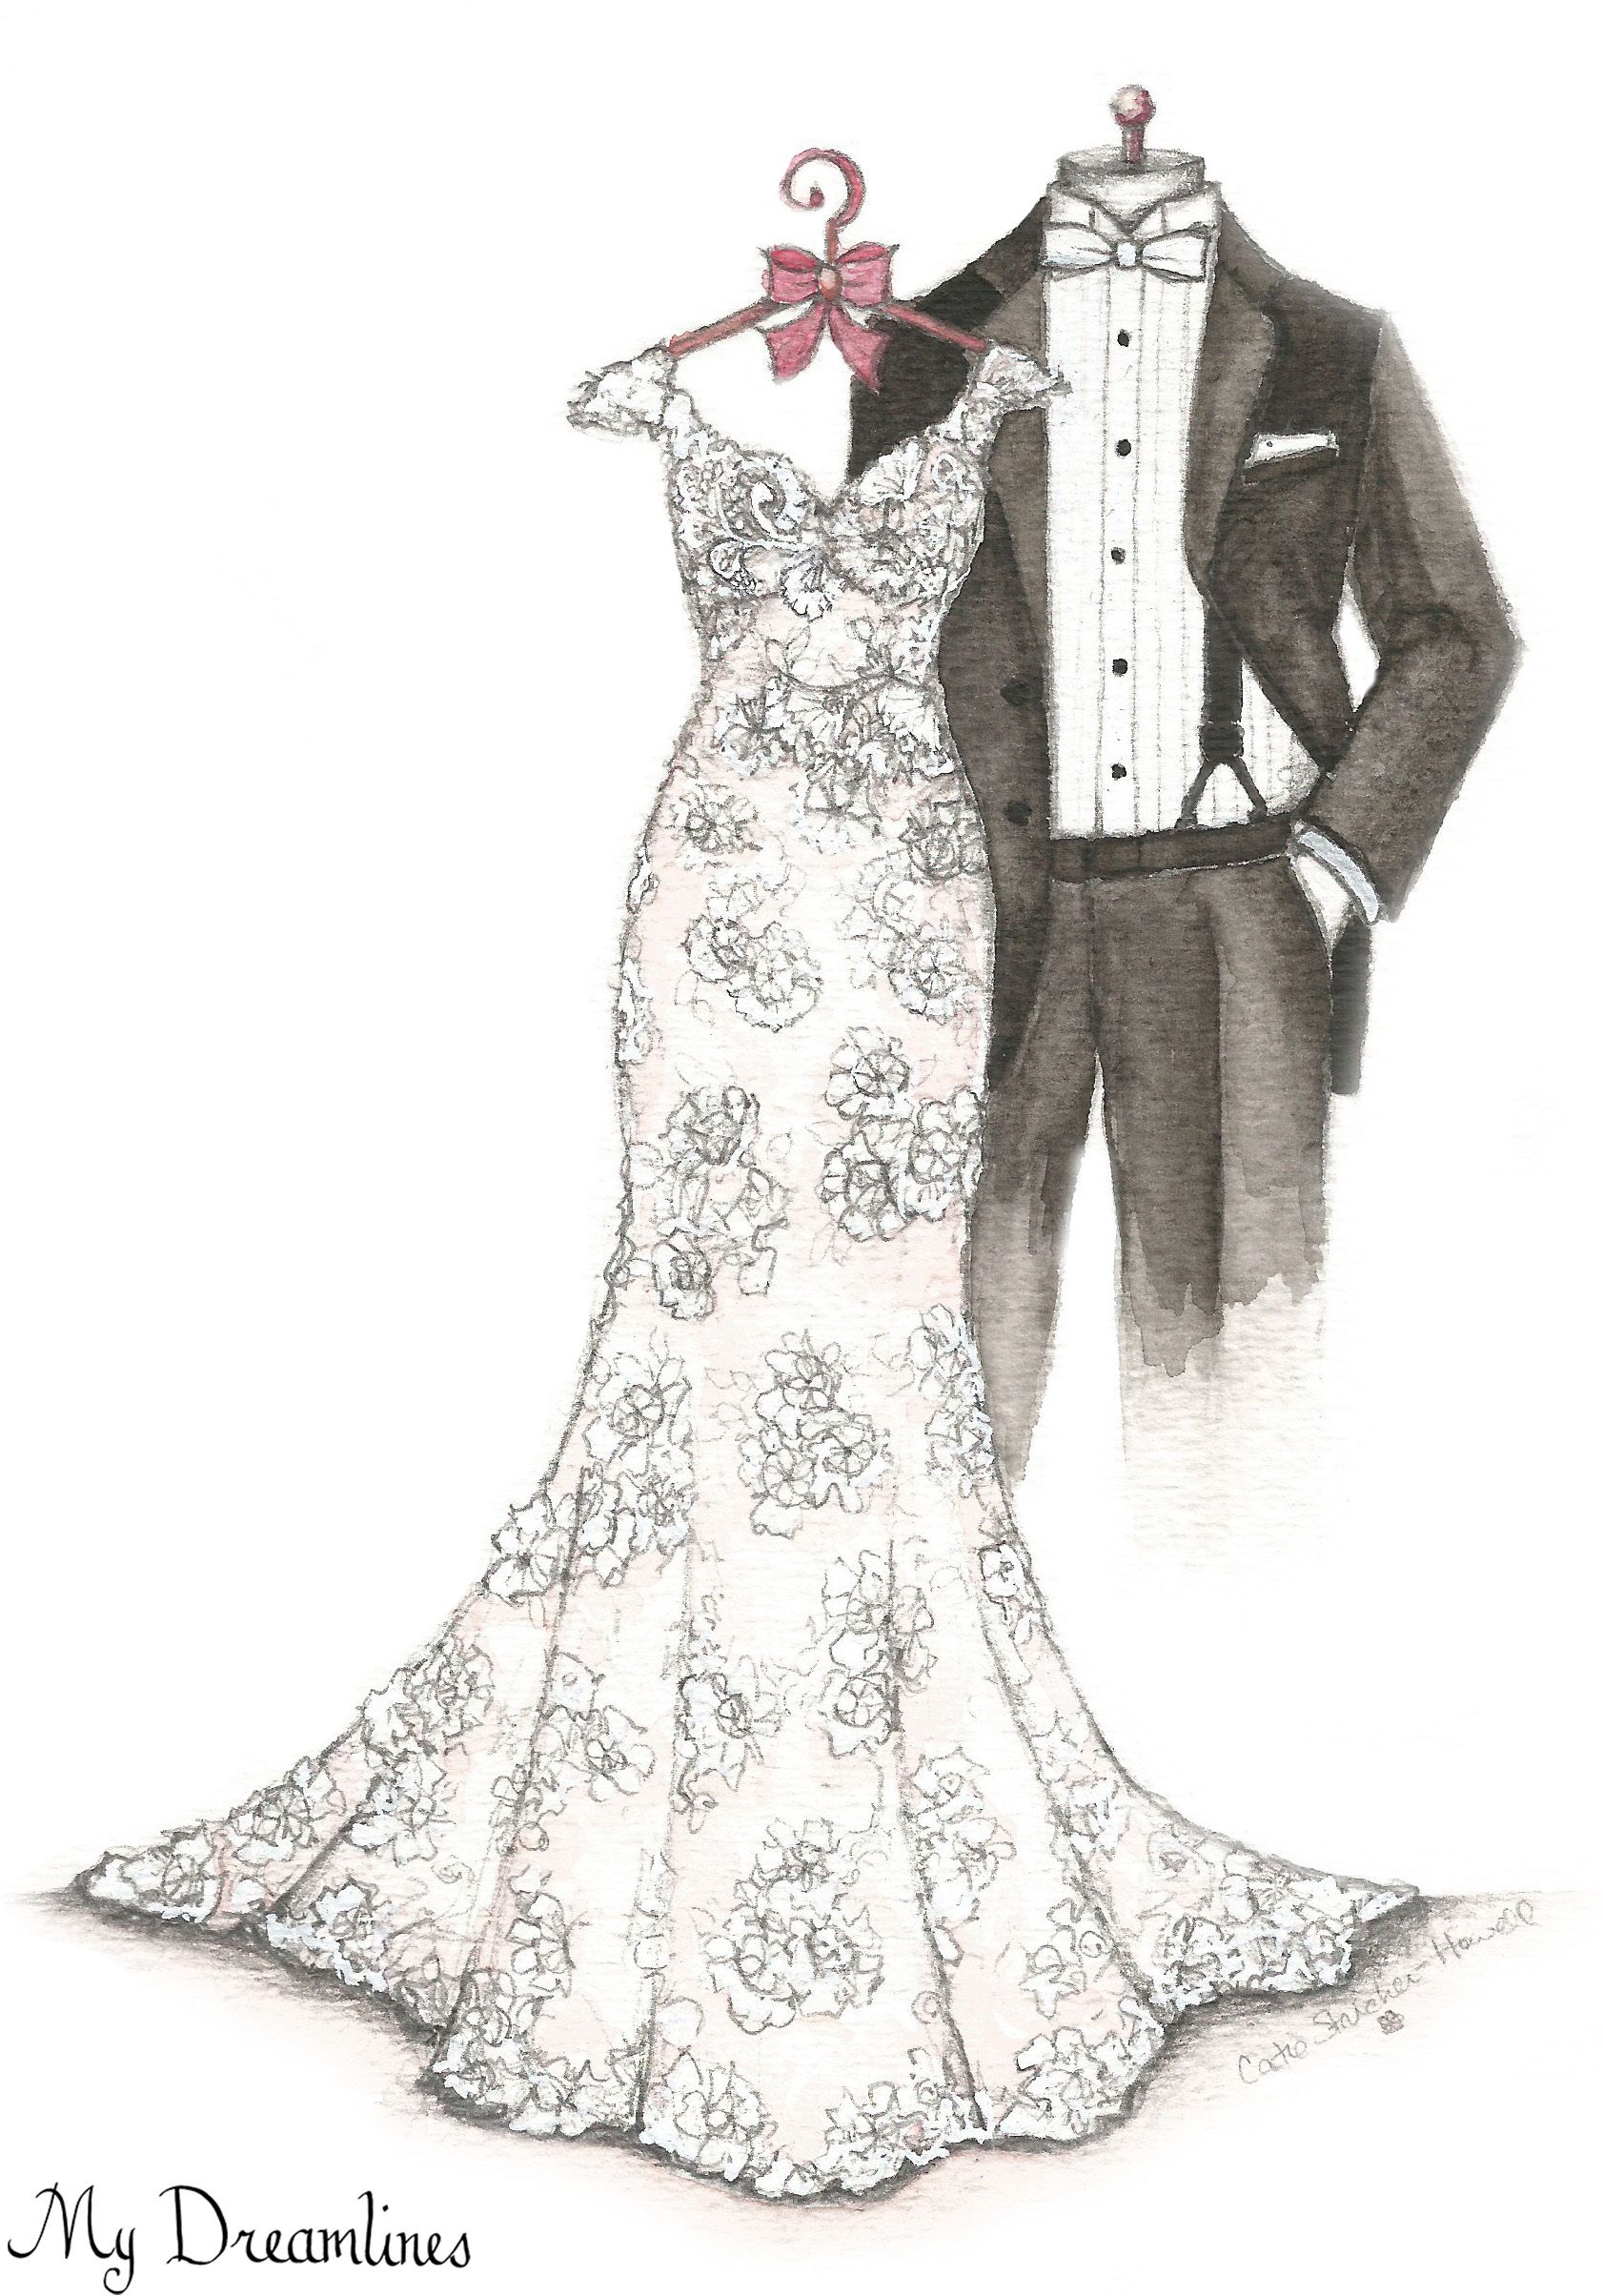 My Dreamlines Wedding Dress Sketch